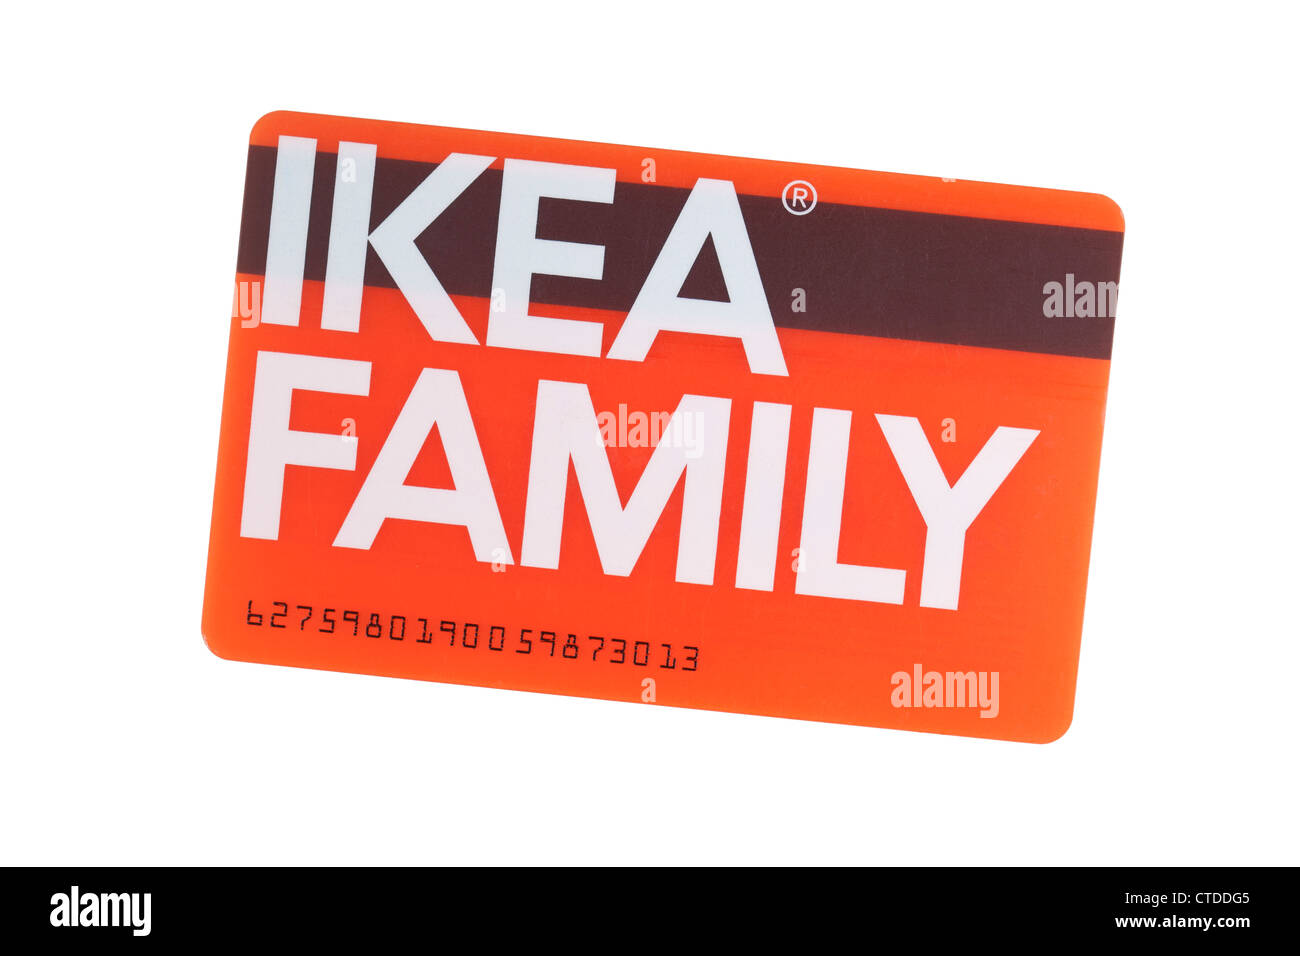 how to be ikea family member singapore